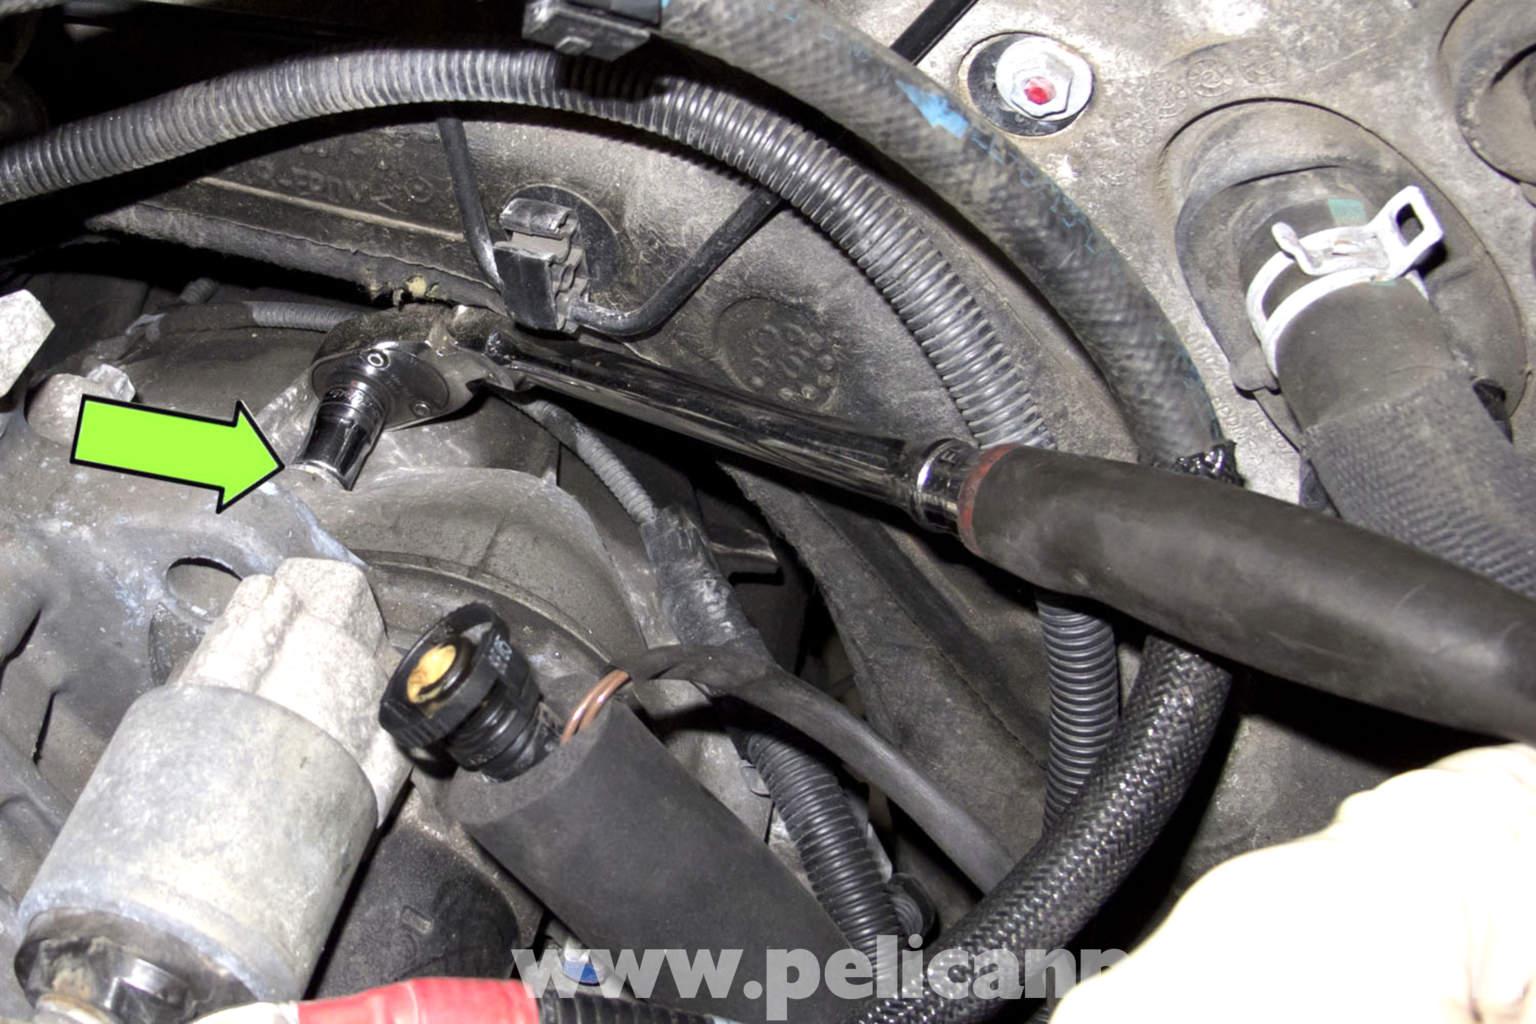 325i Water Pump Wiring Diagram Bmw E90 Starter Replacement E91 E92 E93 Pelican